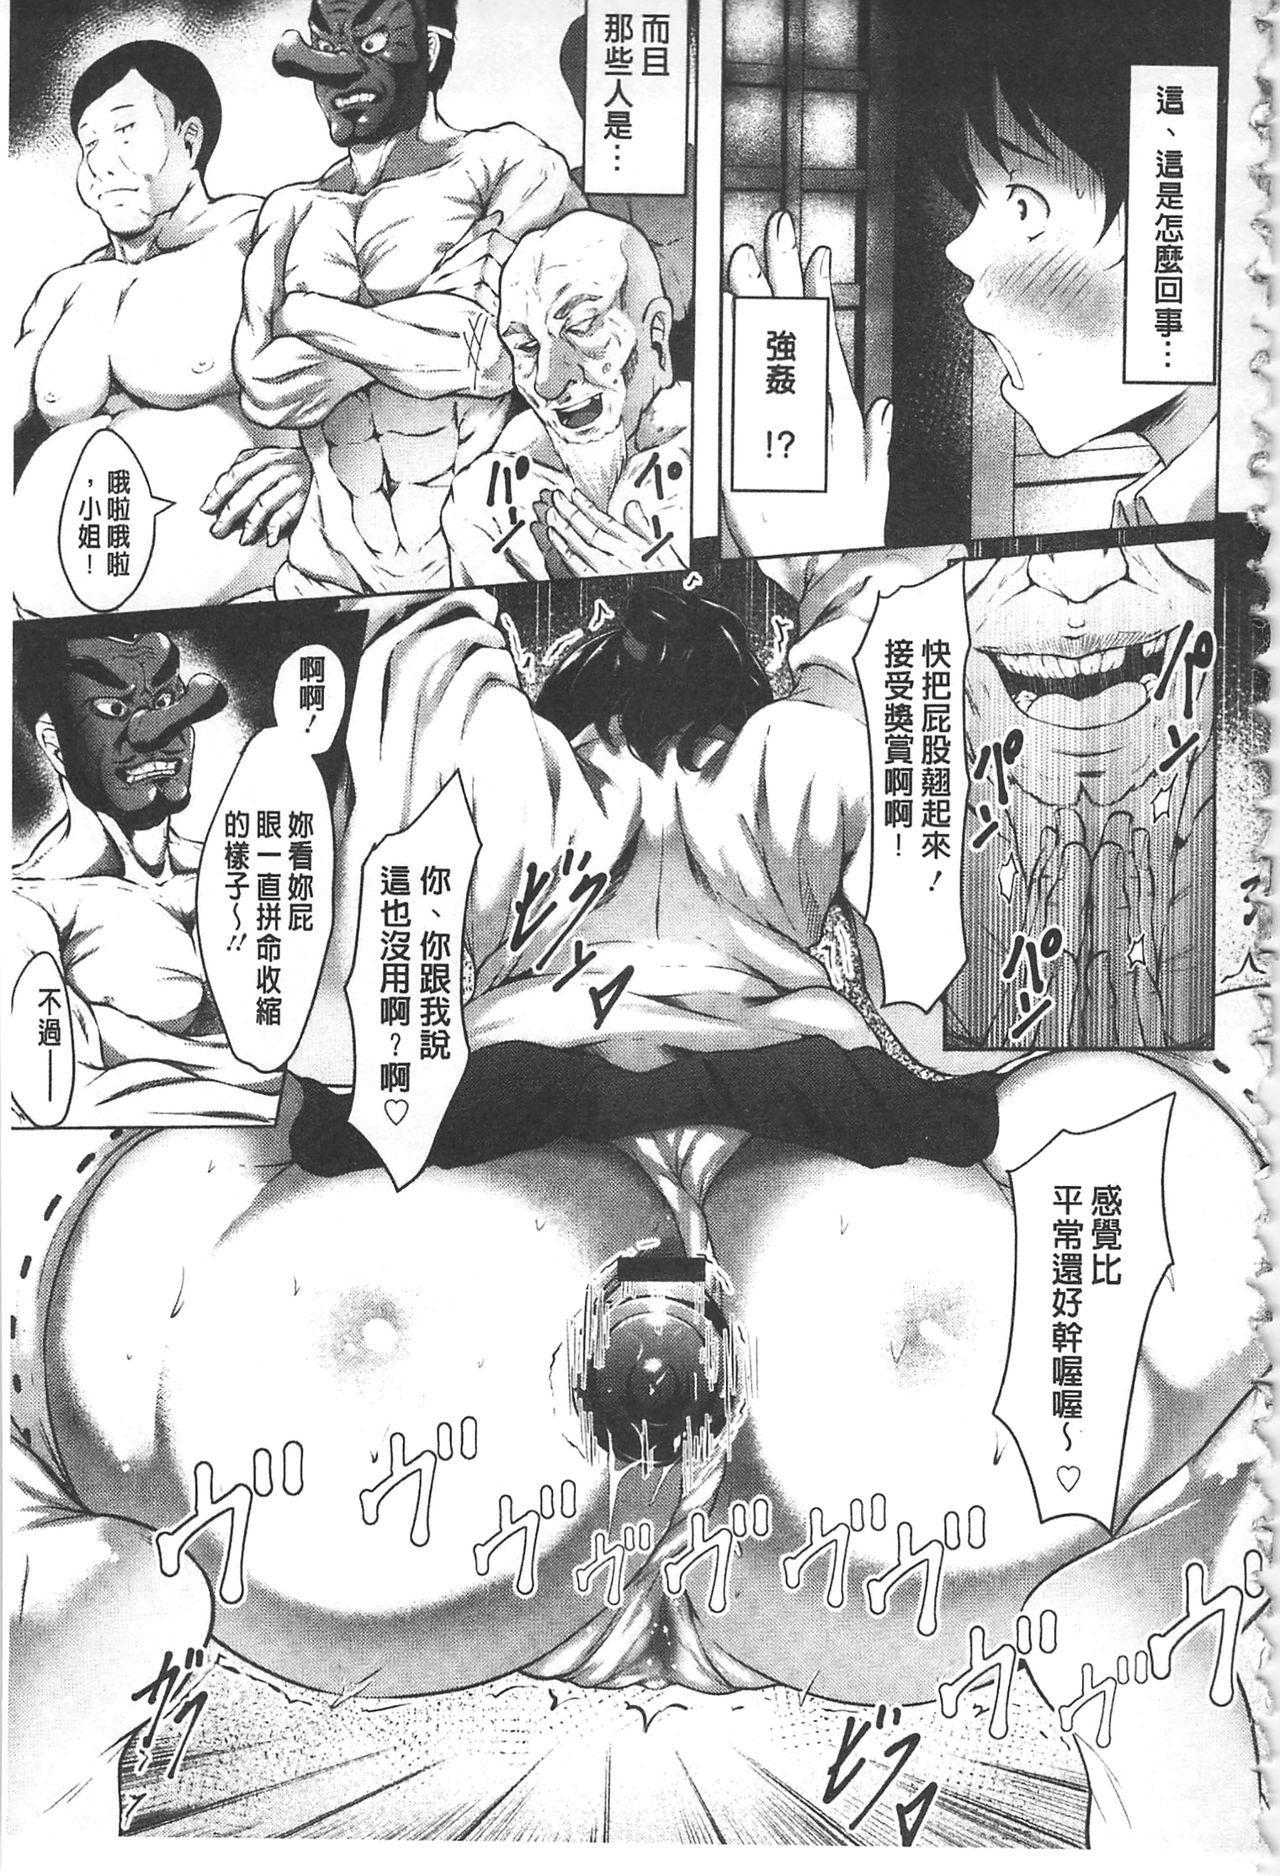 [Lorica] Biinkan Anal ~Kakusei Nejikomi Ana~ | 美淫感猥菊花 塞入擴張覺醒穴 [Chinese] 69